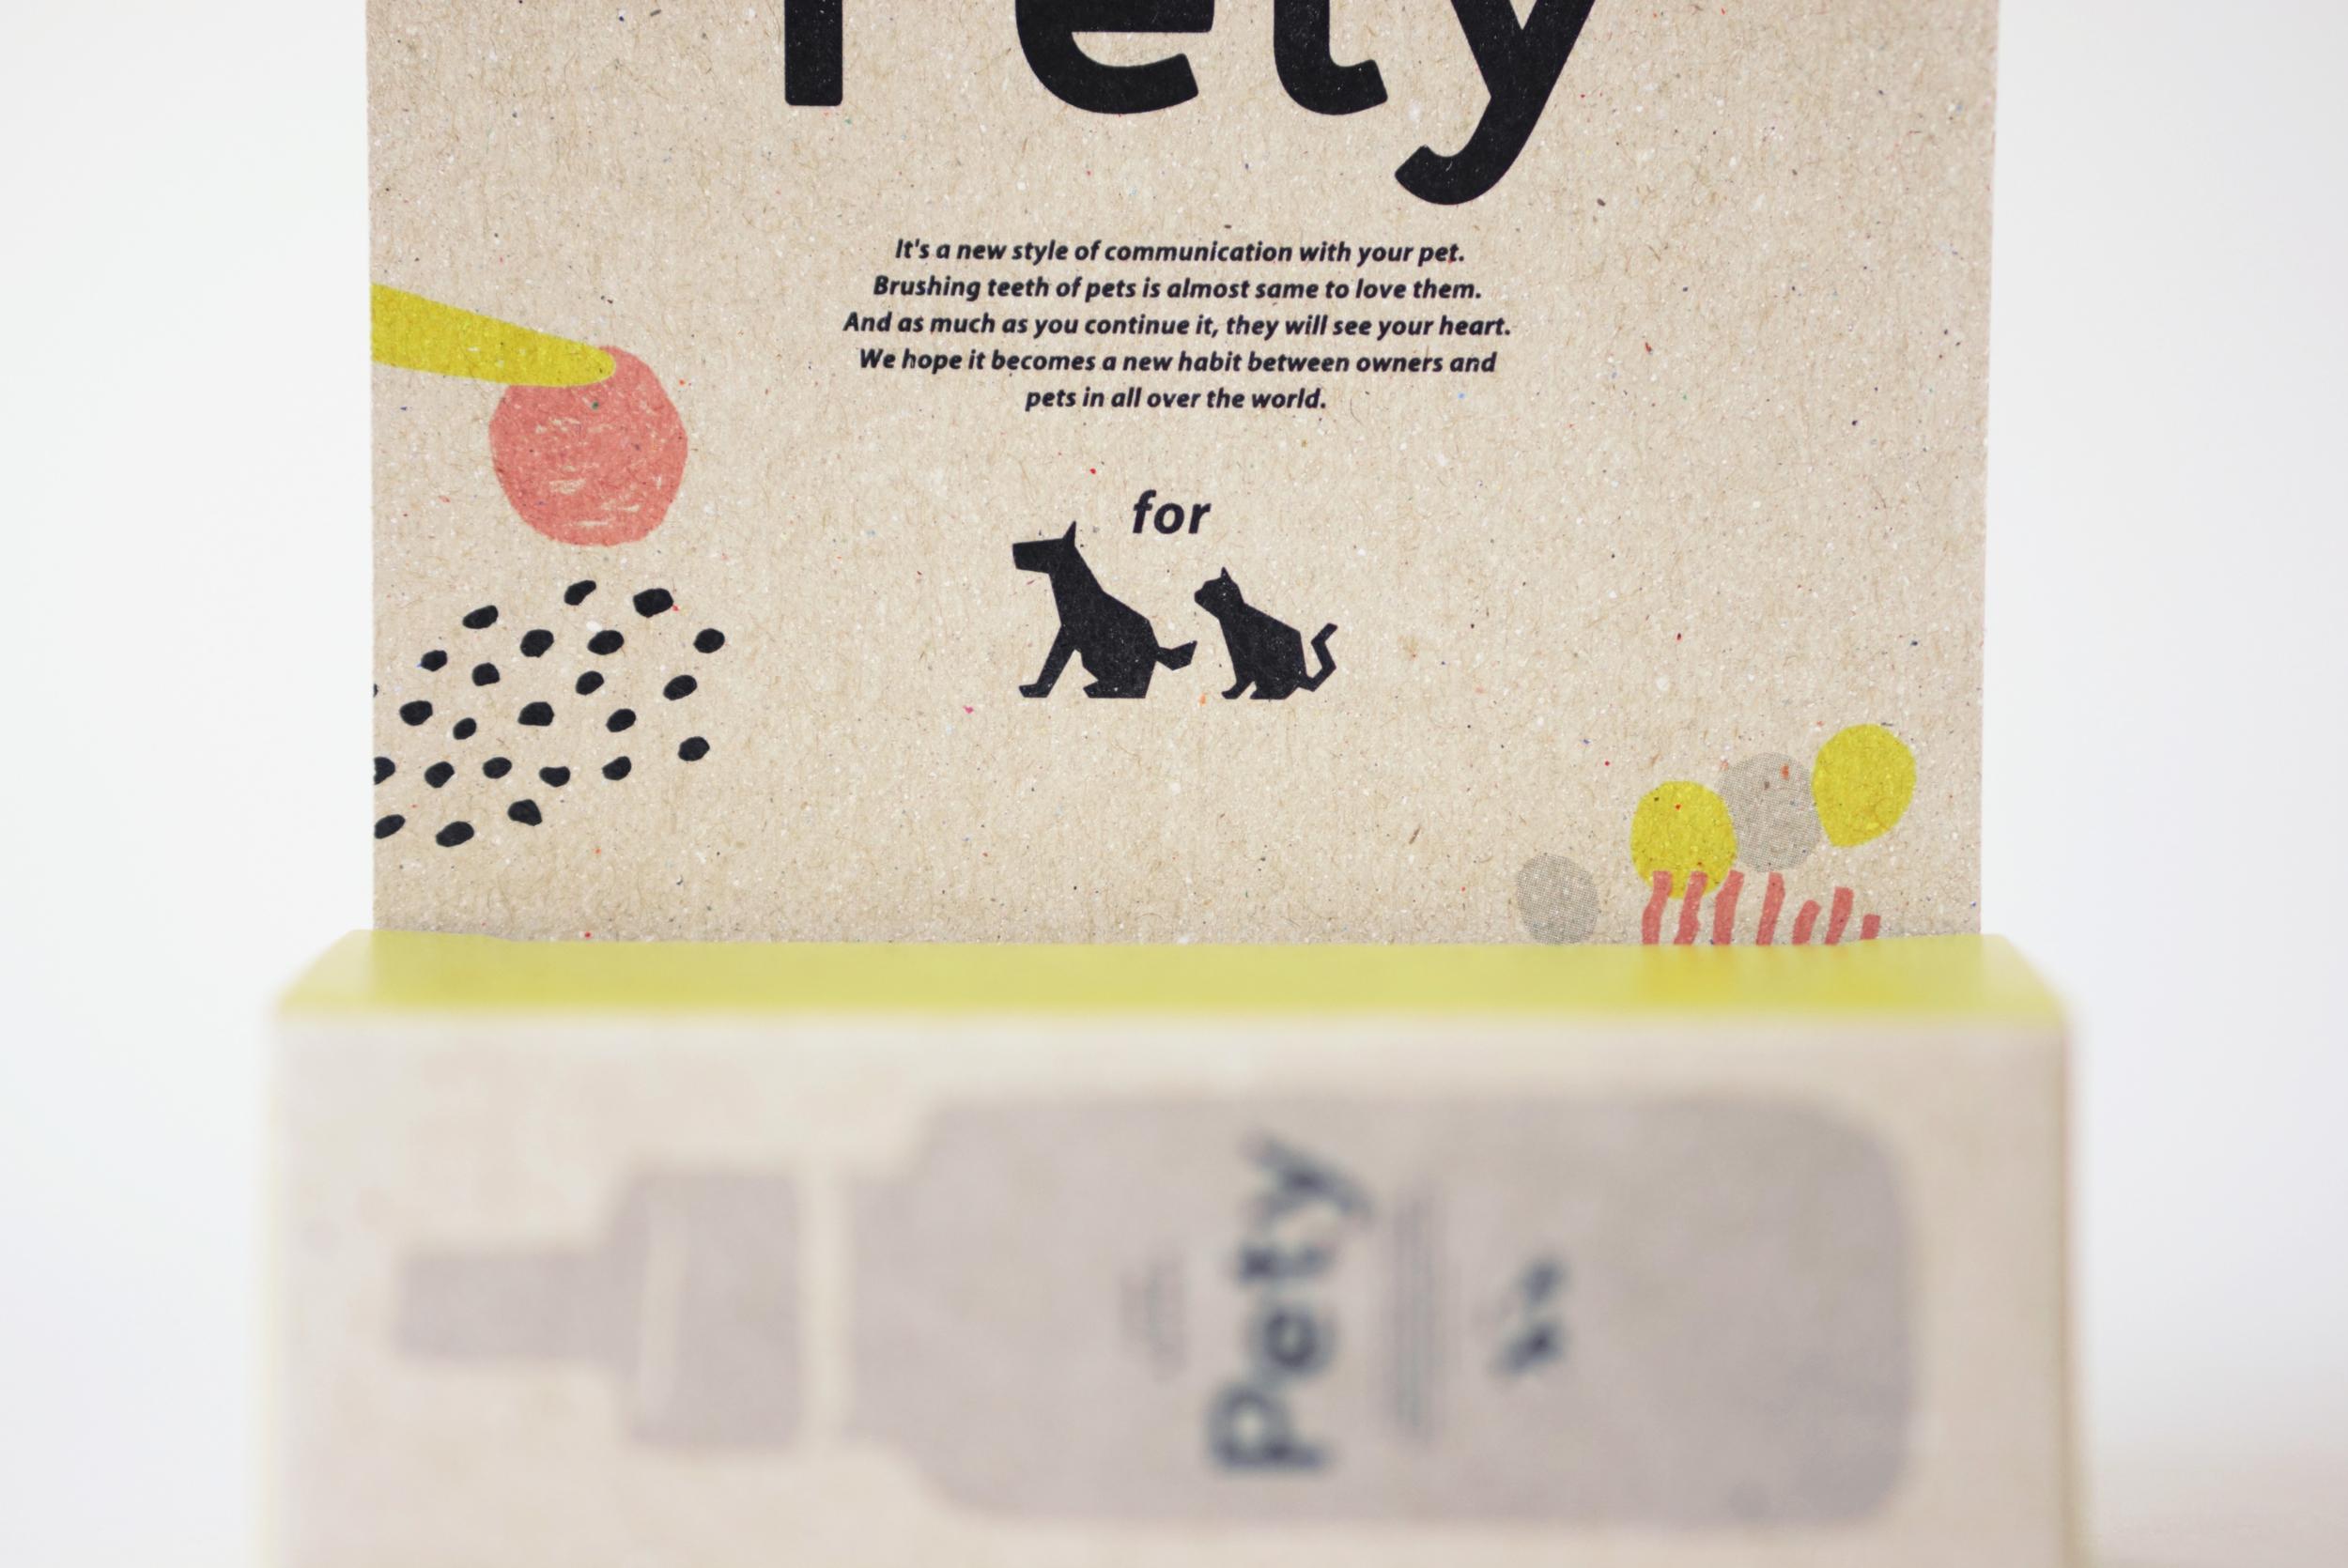 pety_4.jpg